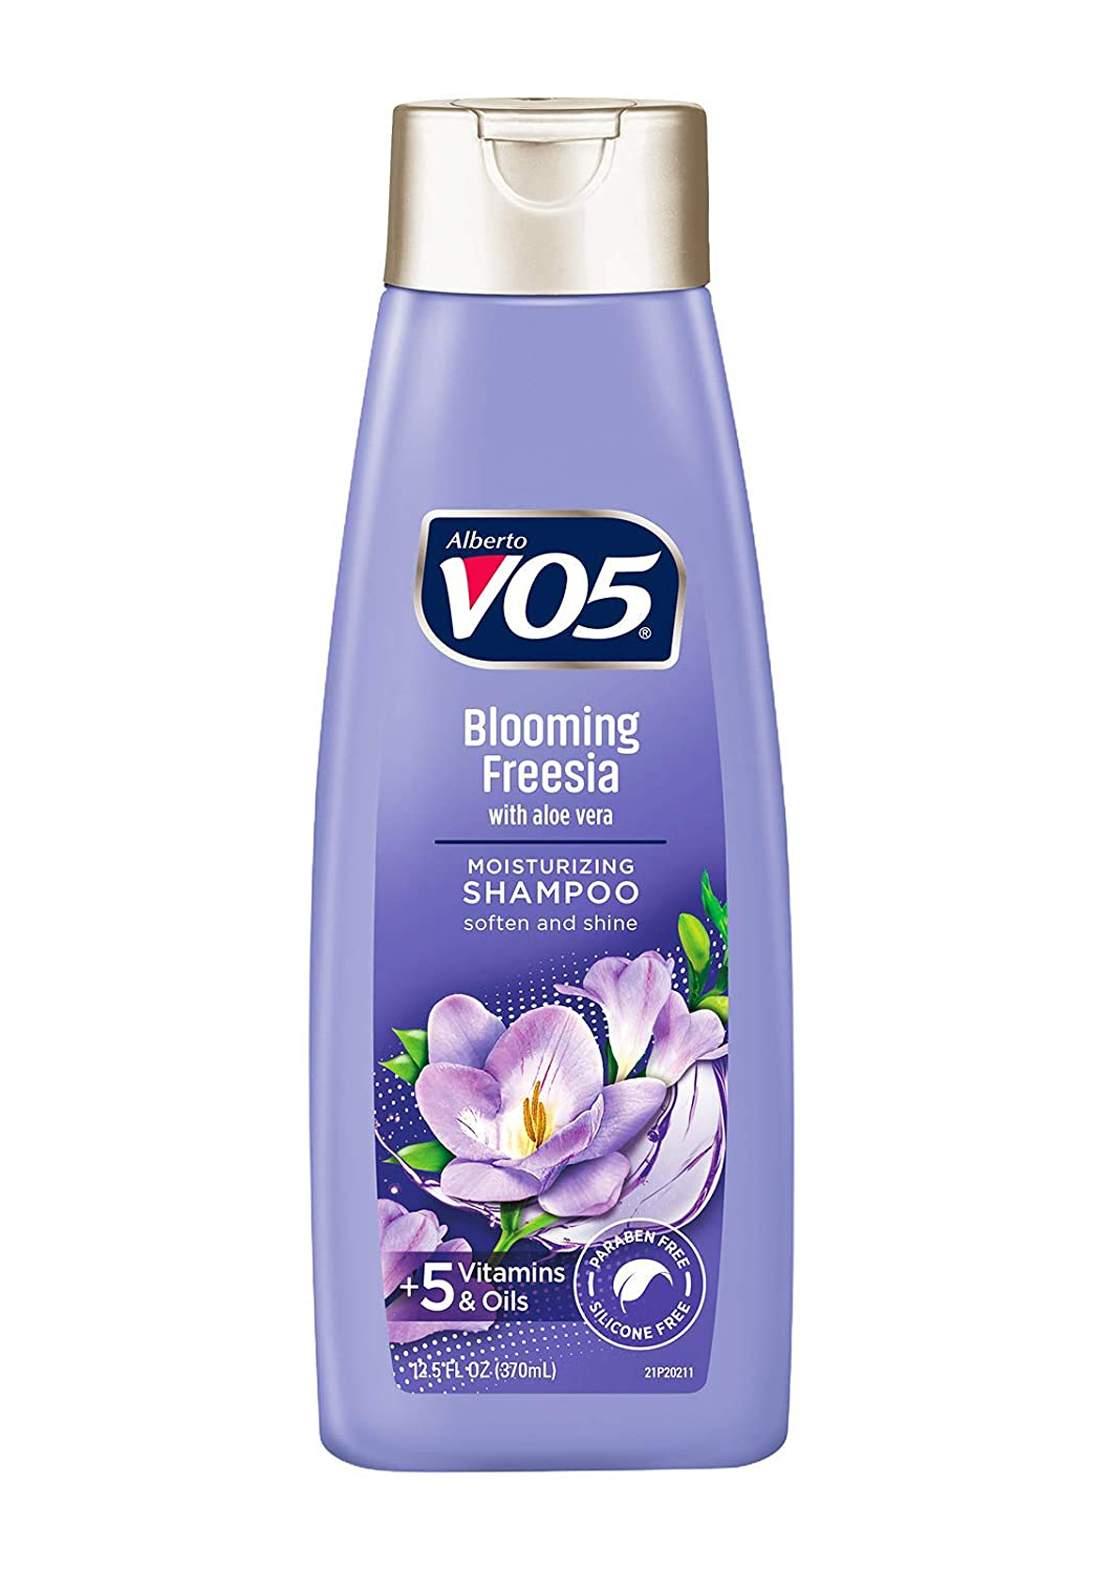 VO5 Alberto Herbal Escapes Hydrating Shampoo 370ml شامبو للشعر